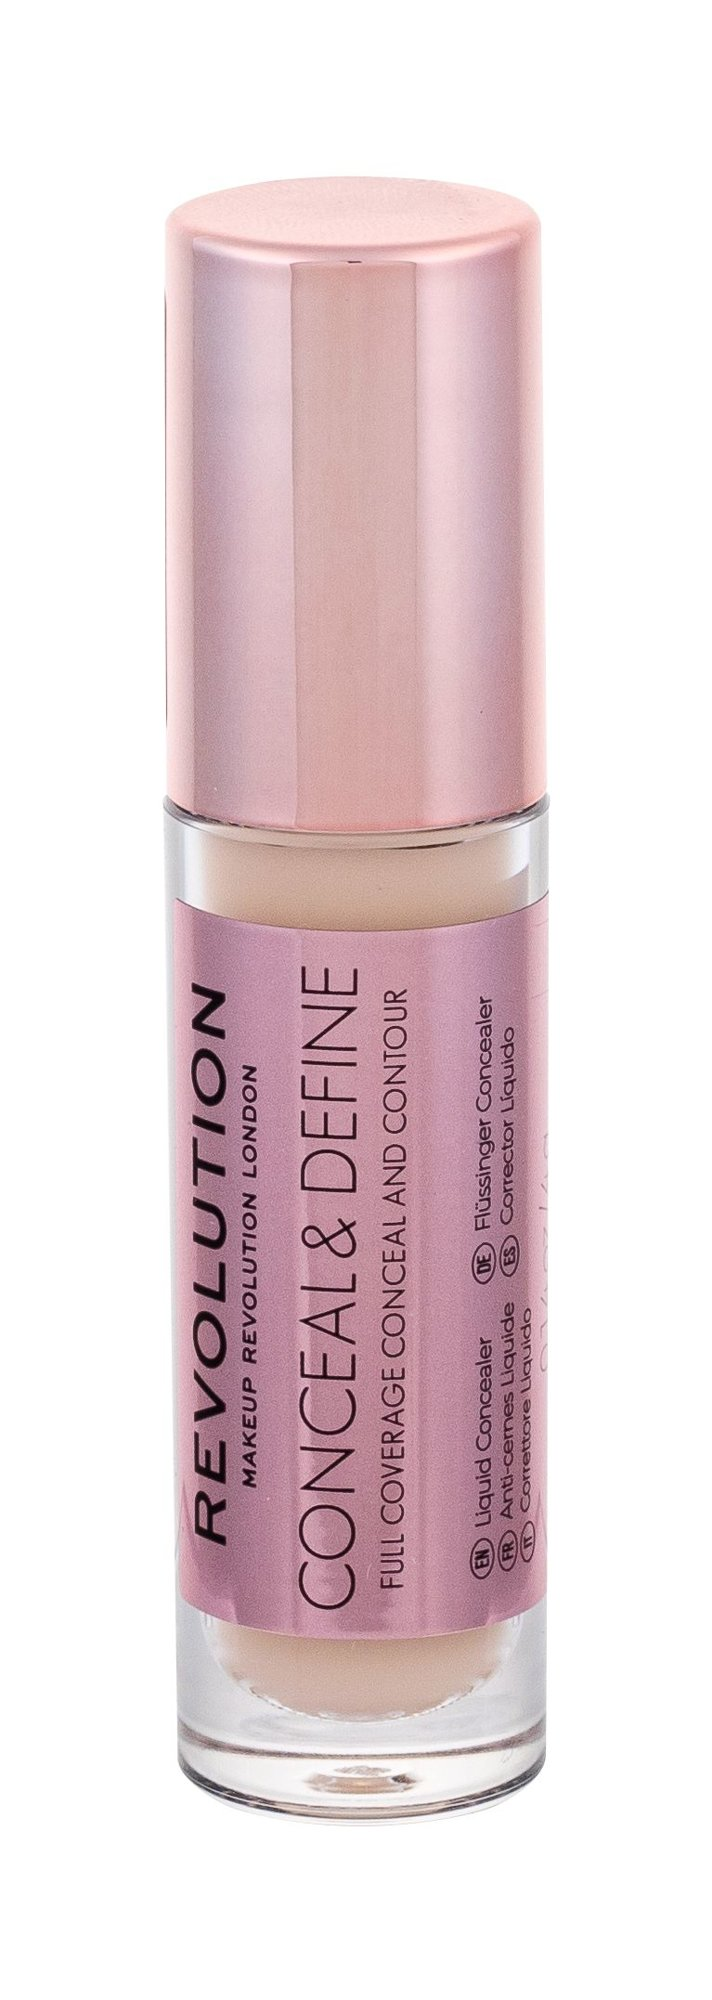 Makeup Revolution London Conceal & Define Corrector 4ml C2